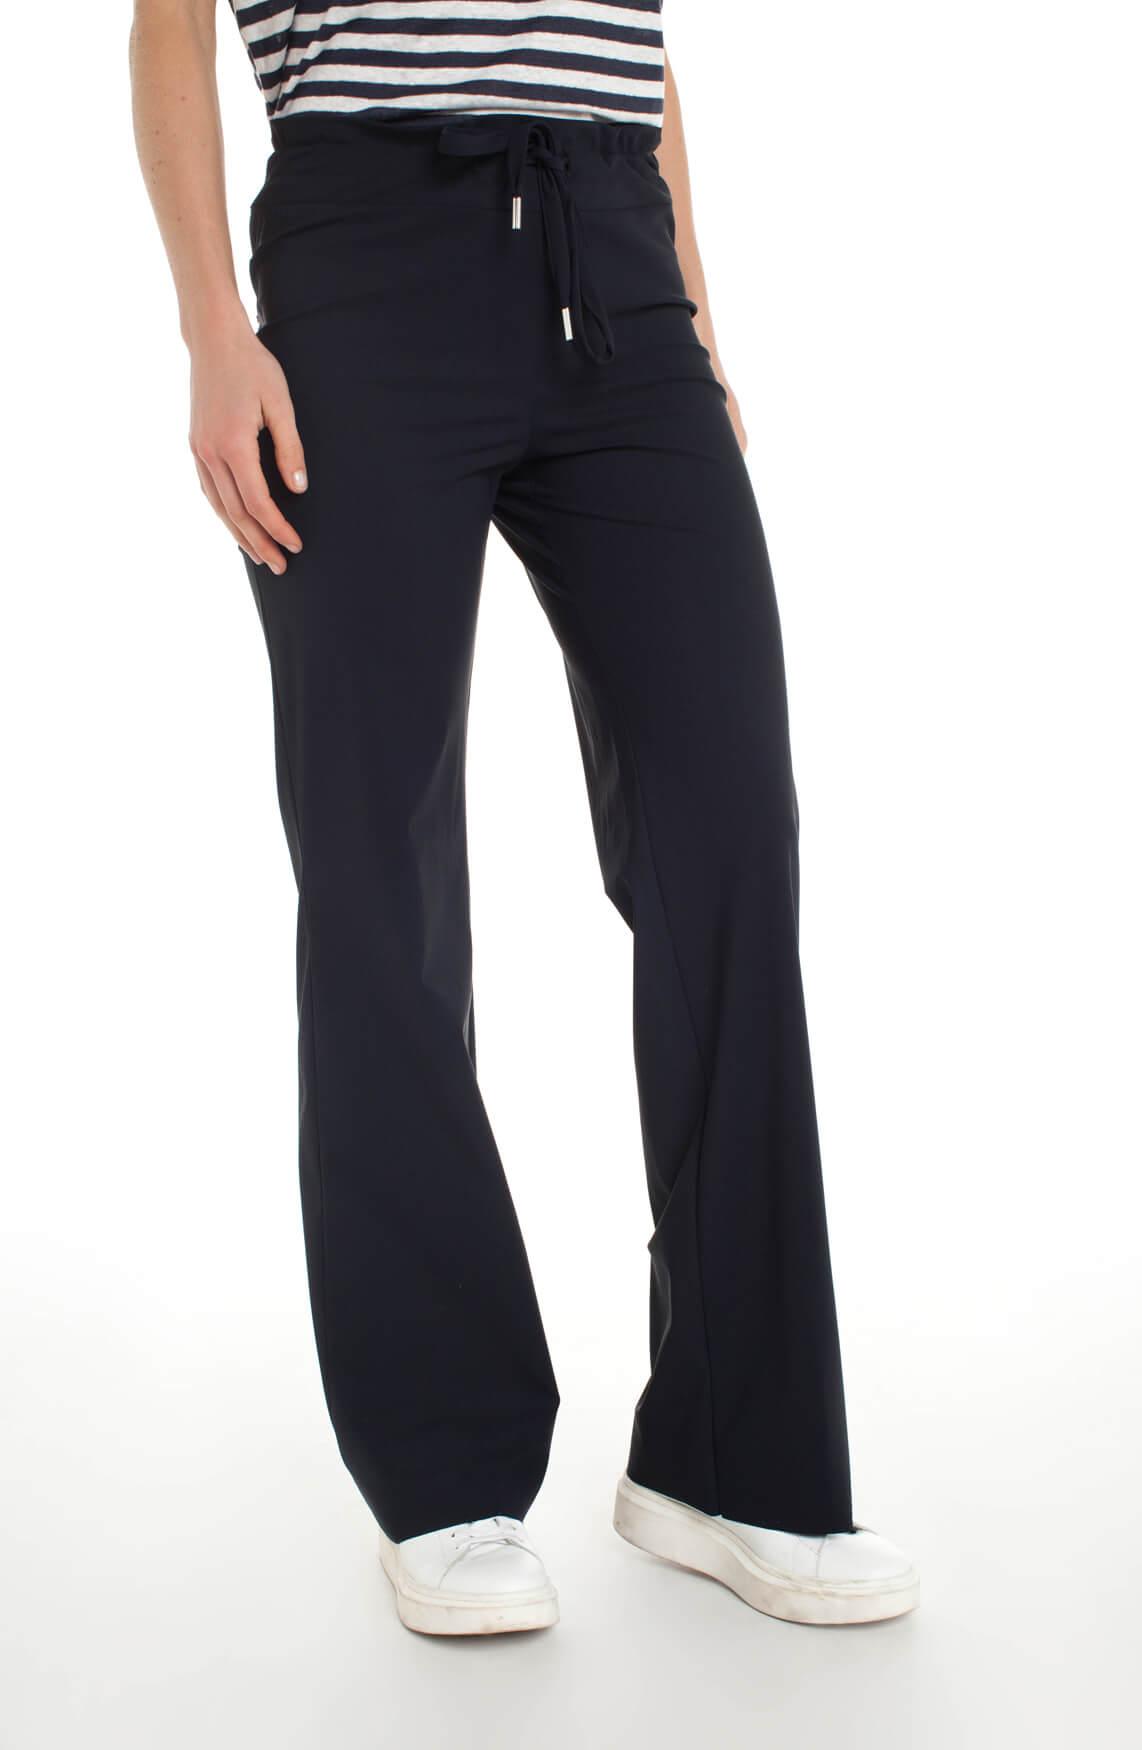 Jane Lushka Dames Jersey flared broek Blauw